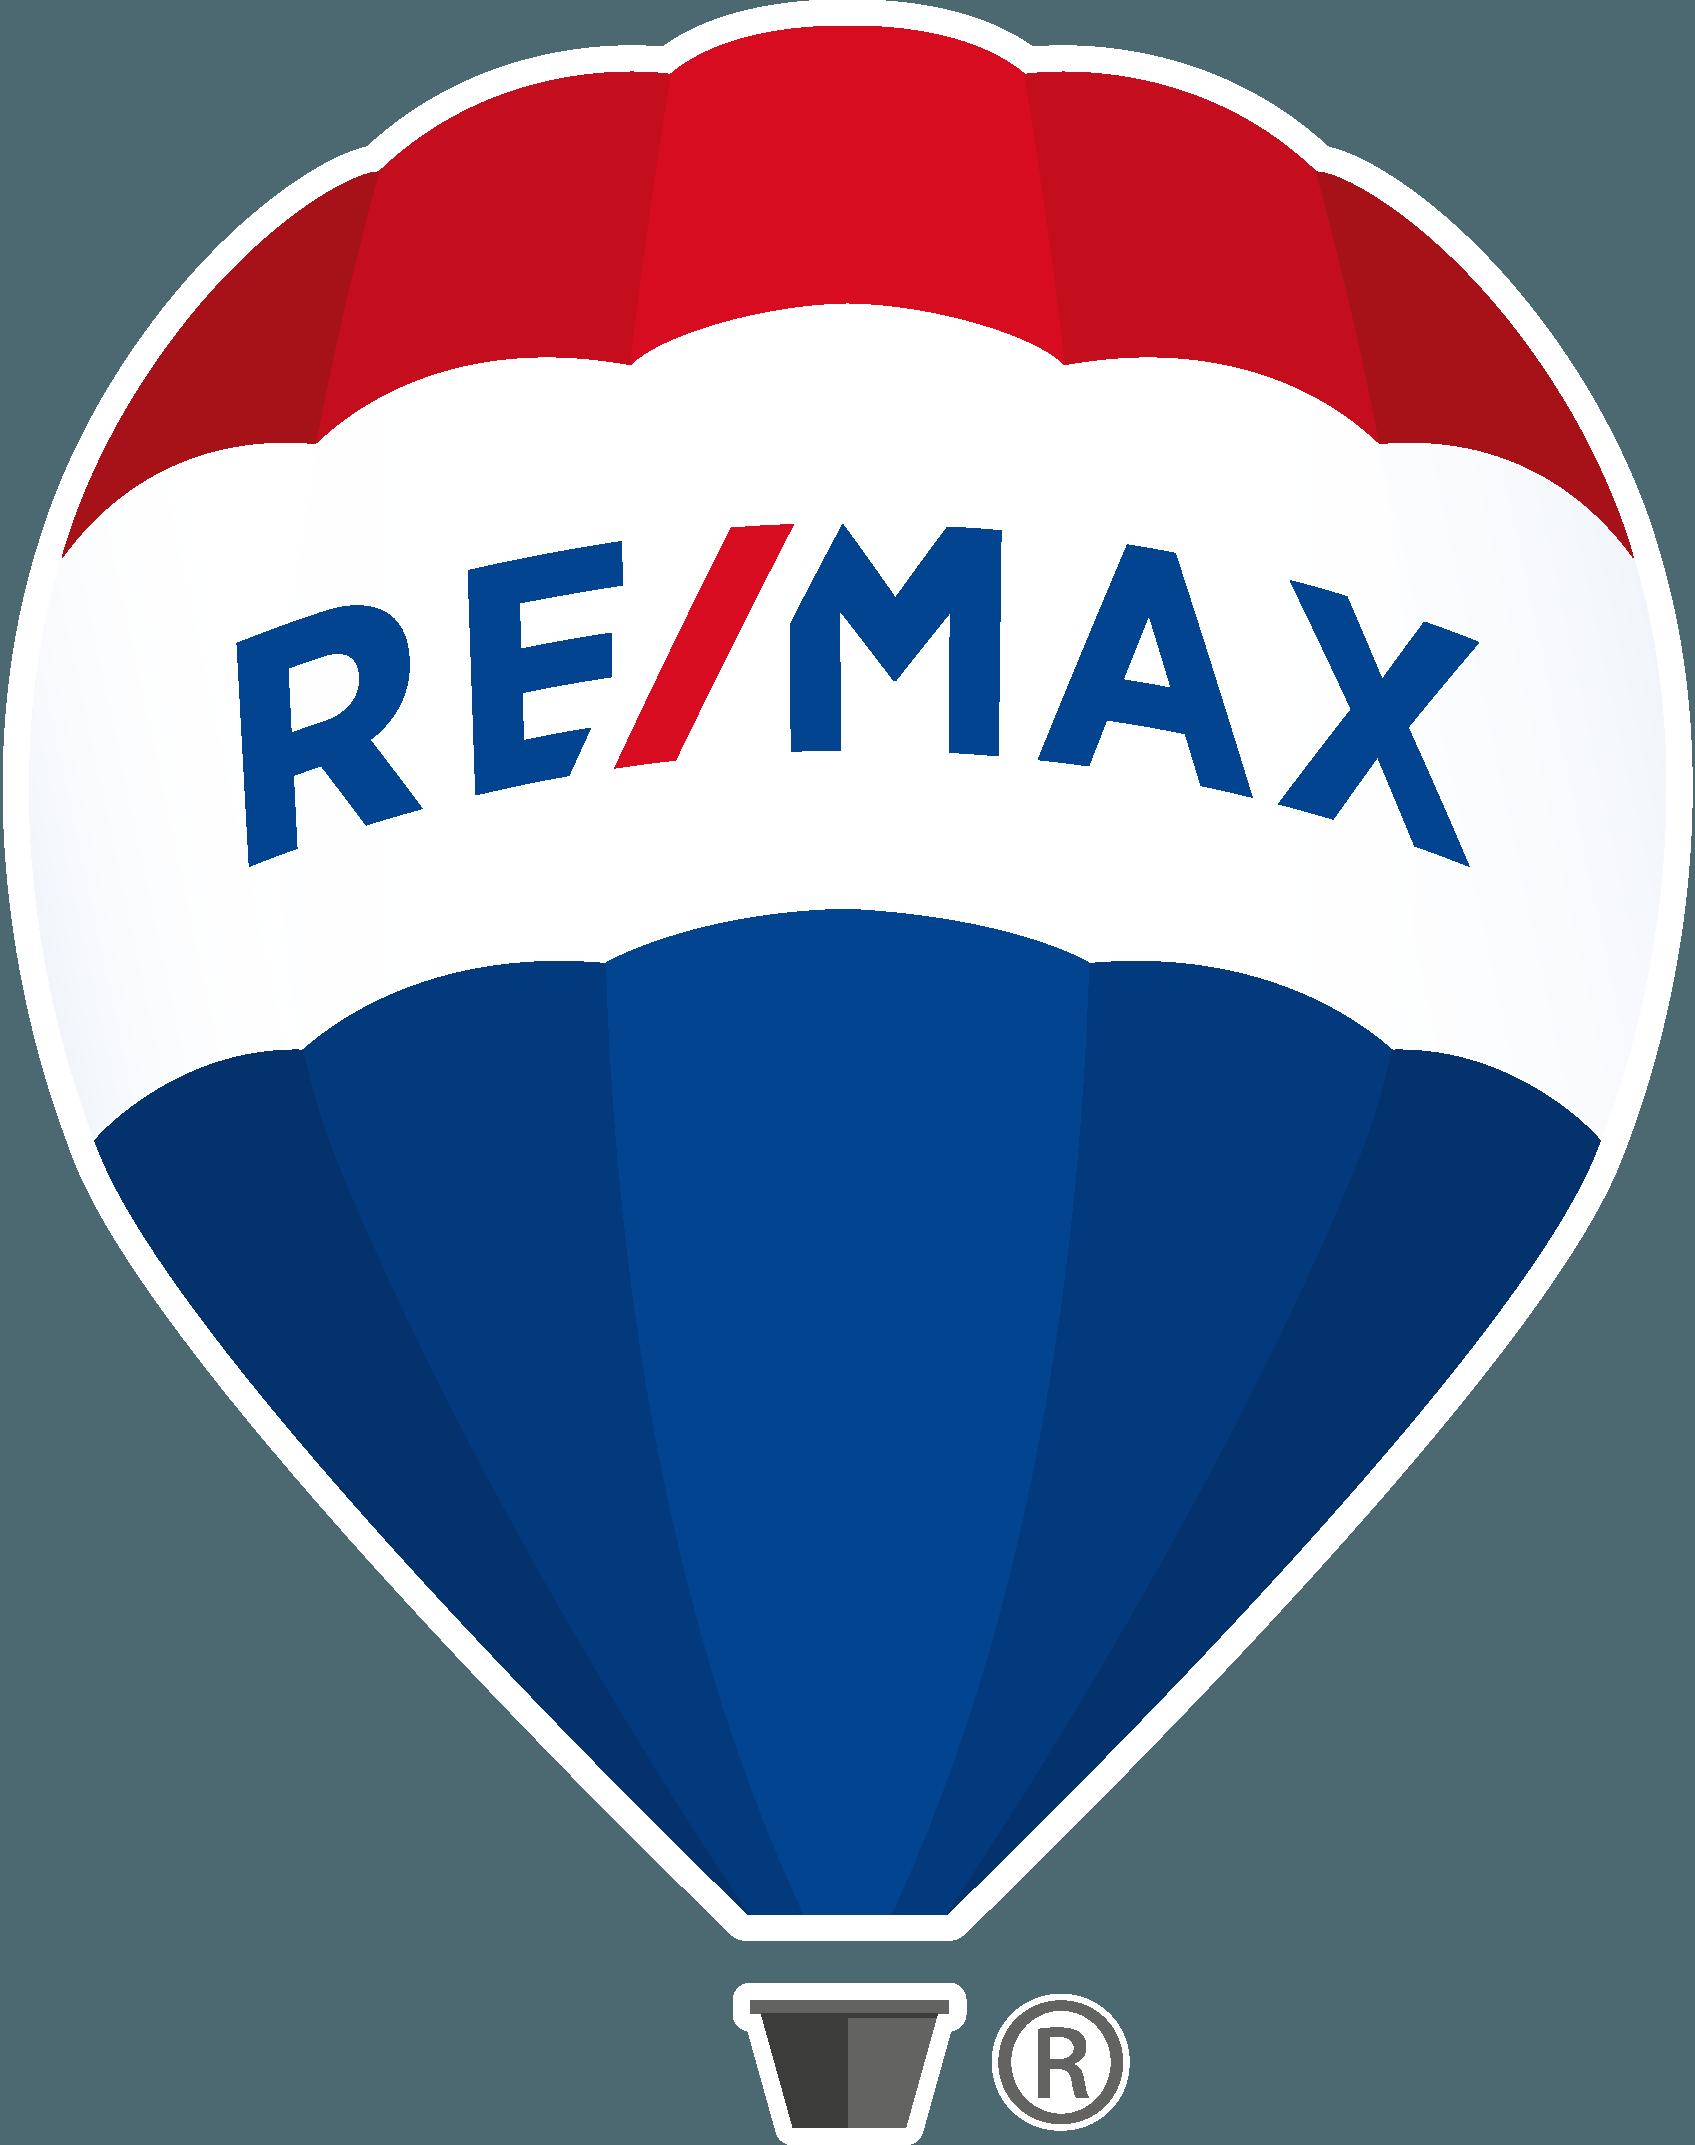 Remax Balloon Logo png